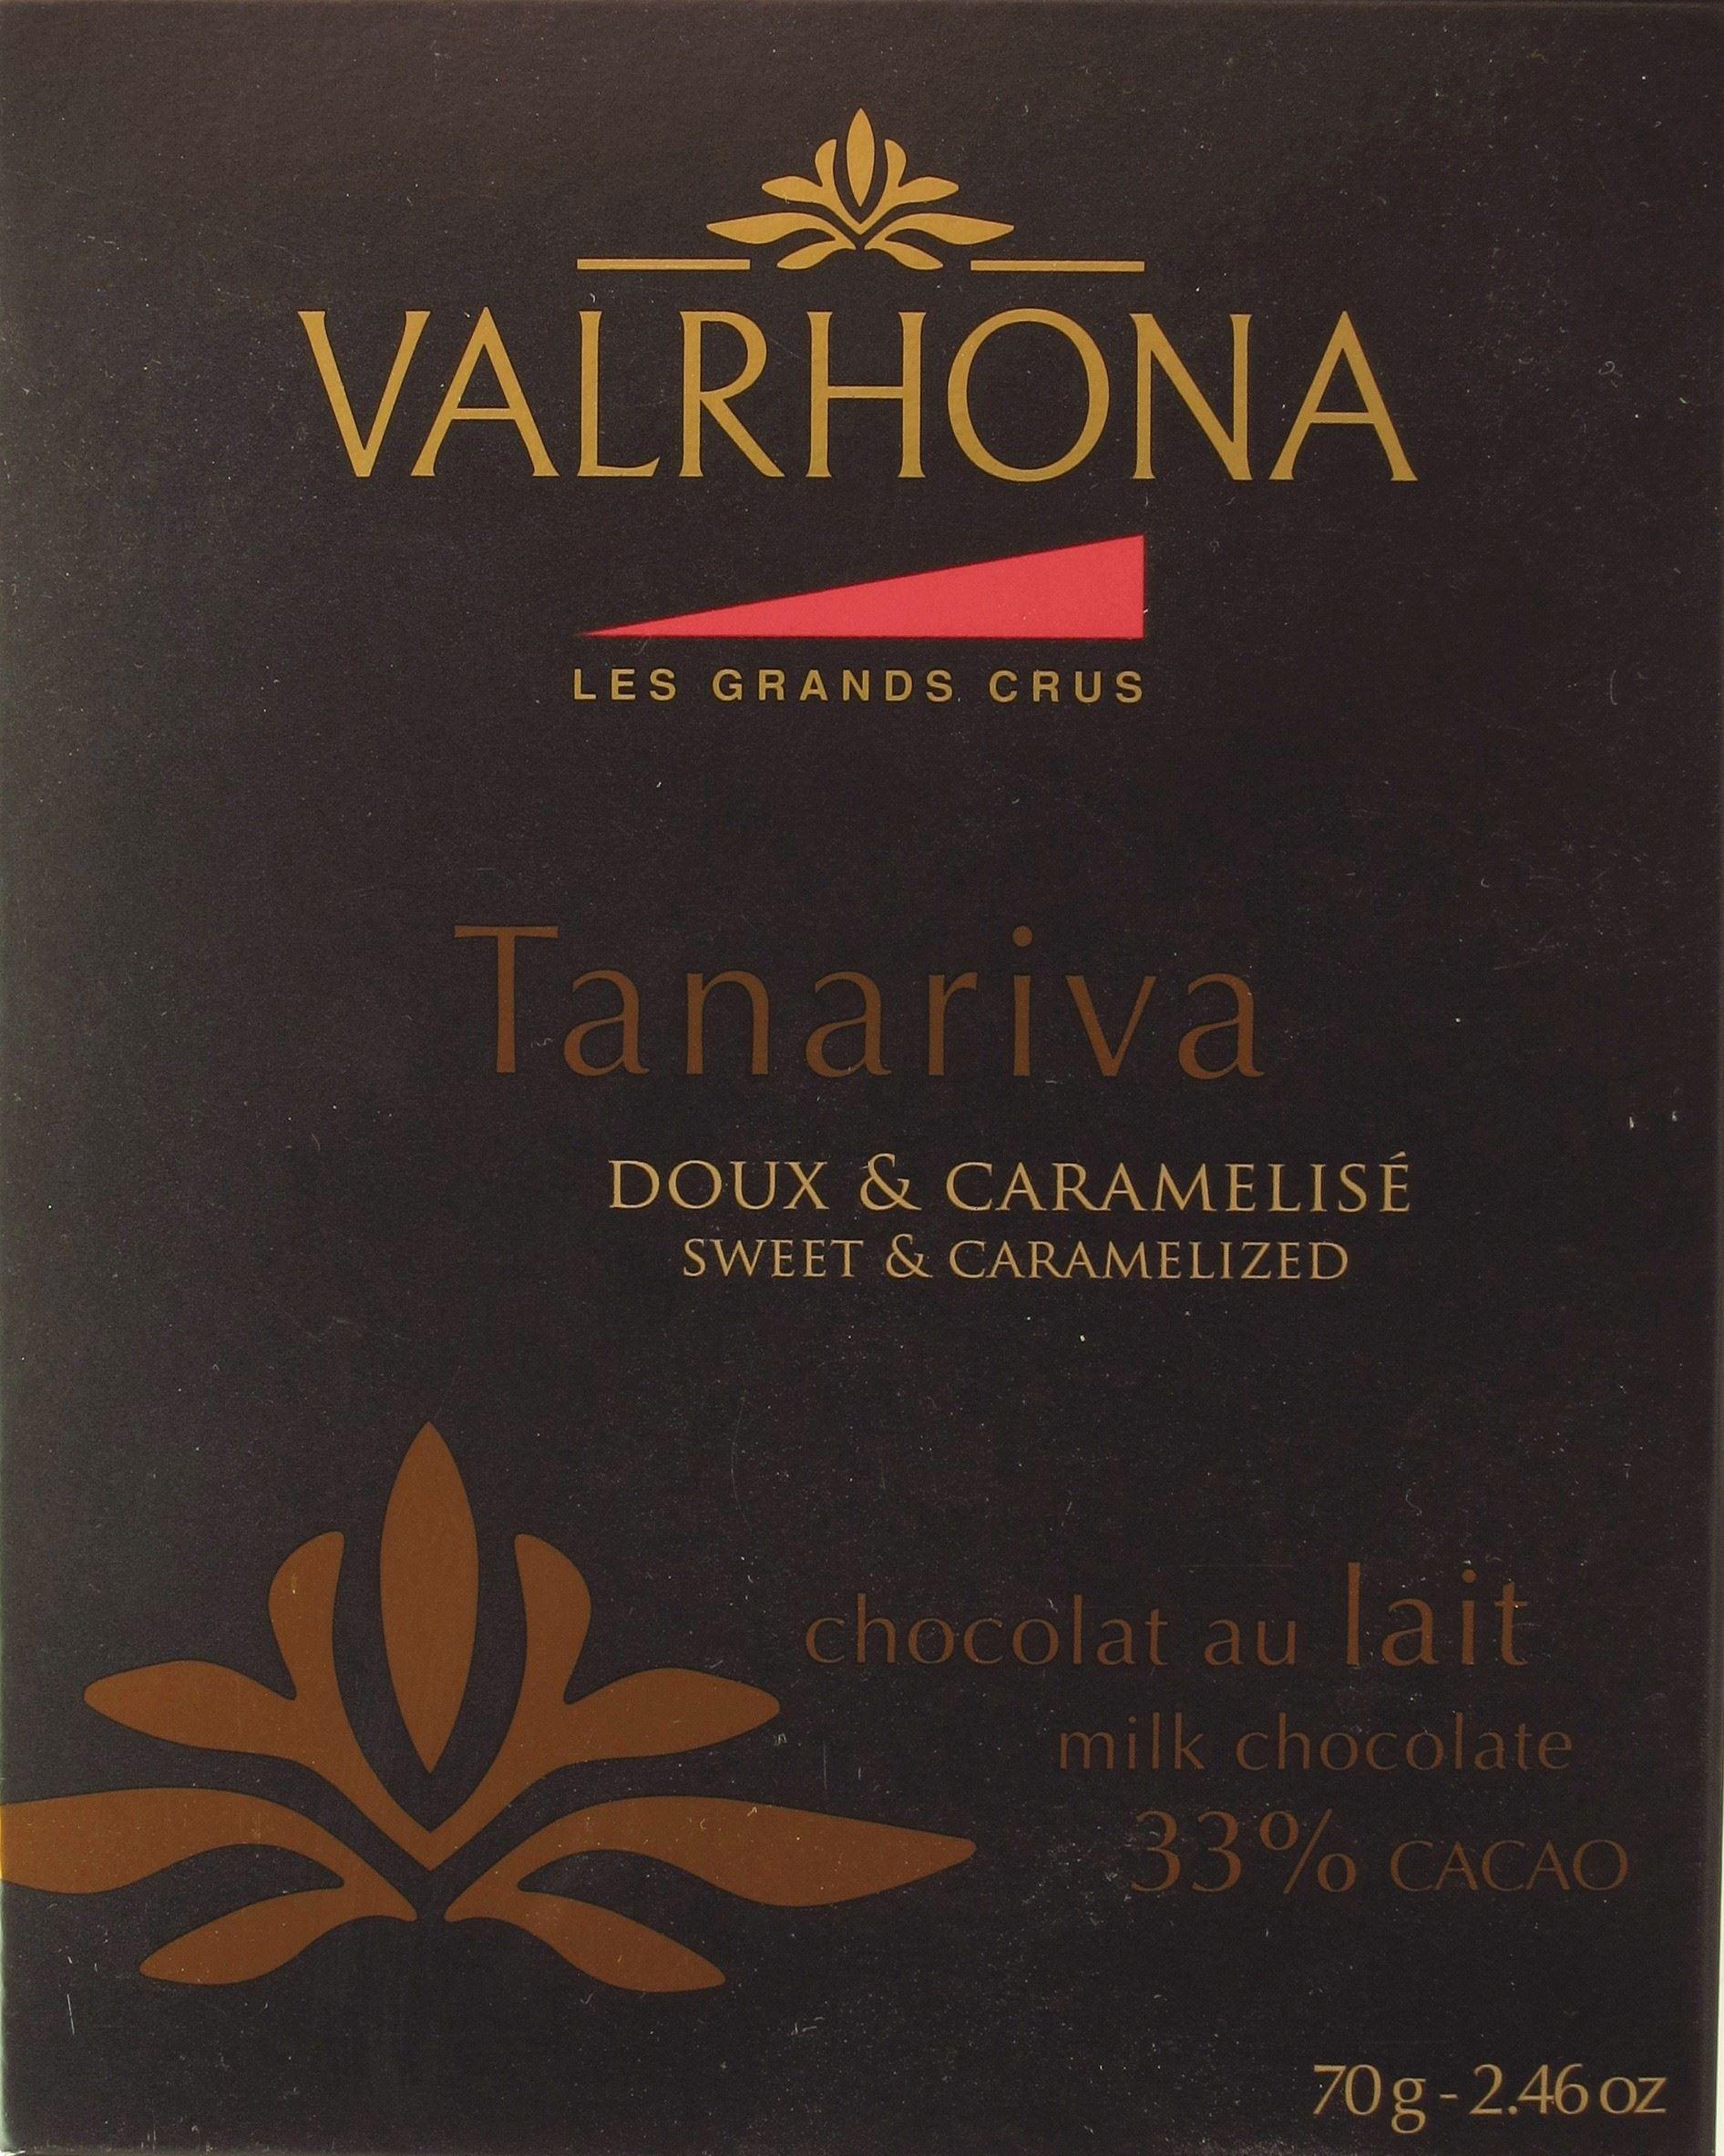 Valrhona Tanariva Milchschokolade Vorderseite